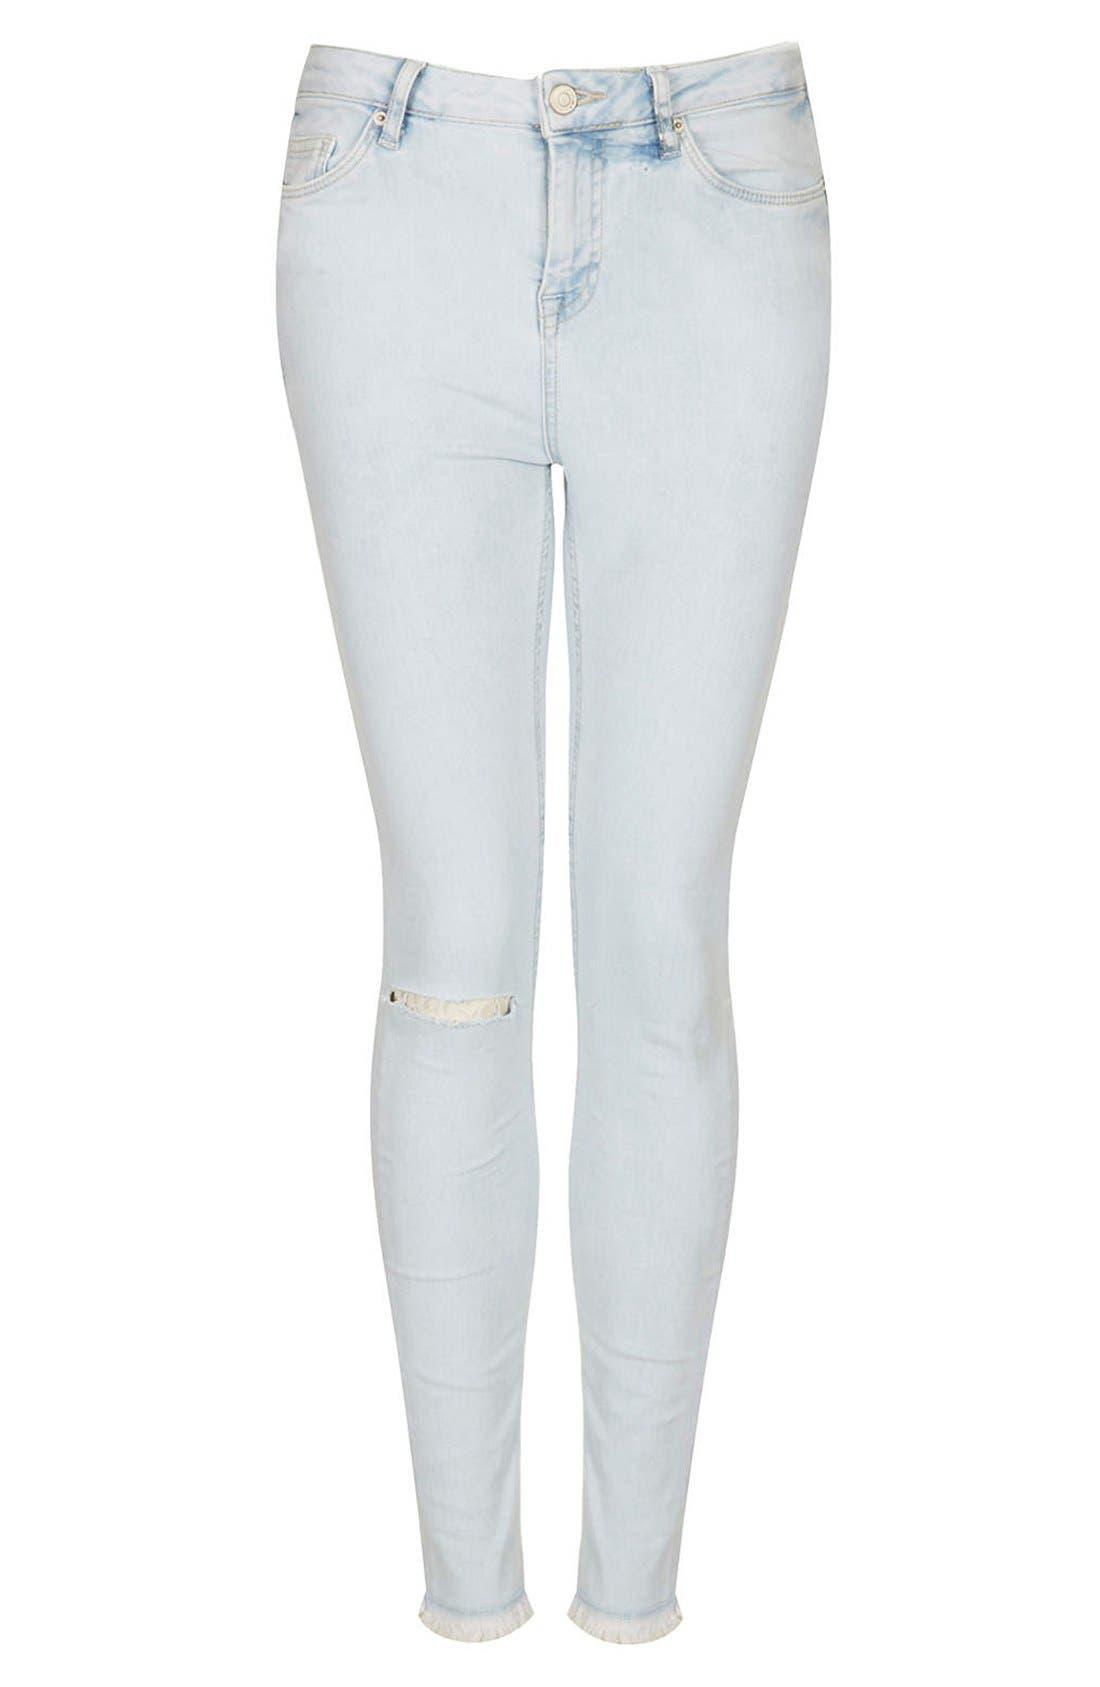 Alternate Image 3  - Topshop Moto 'Jamie' High Rise Skinny Jeans (Light Blue) (Regular & Short)